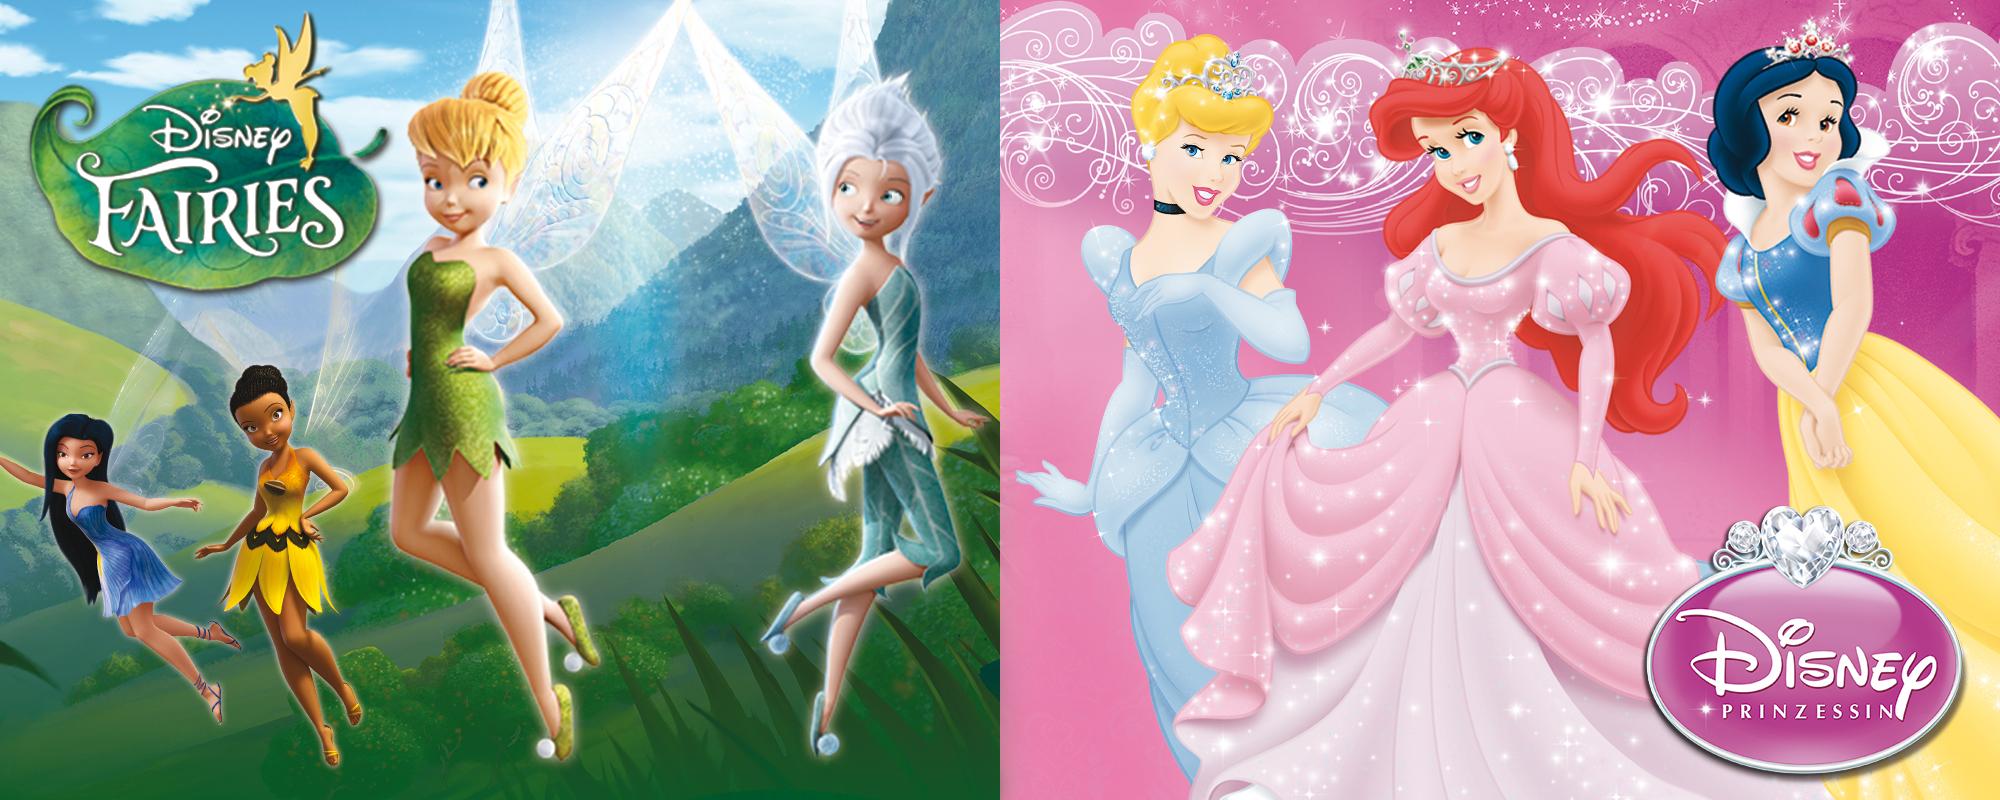 Disney Prinzessinnen & Disney Feen